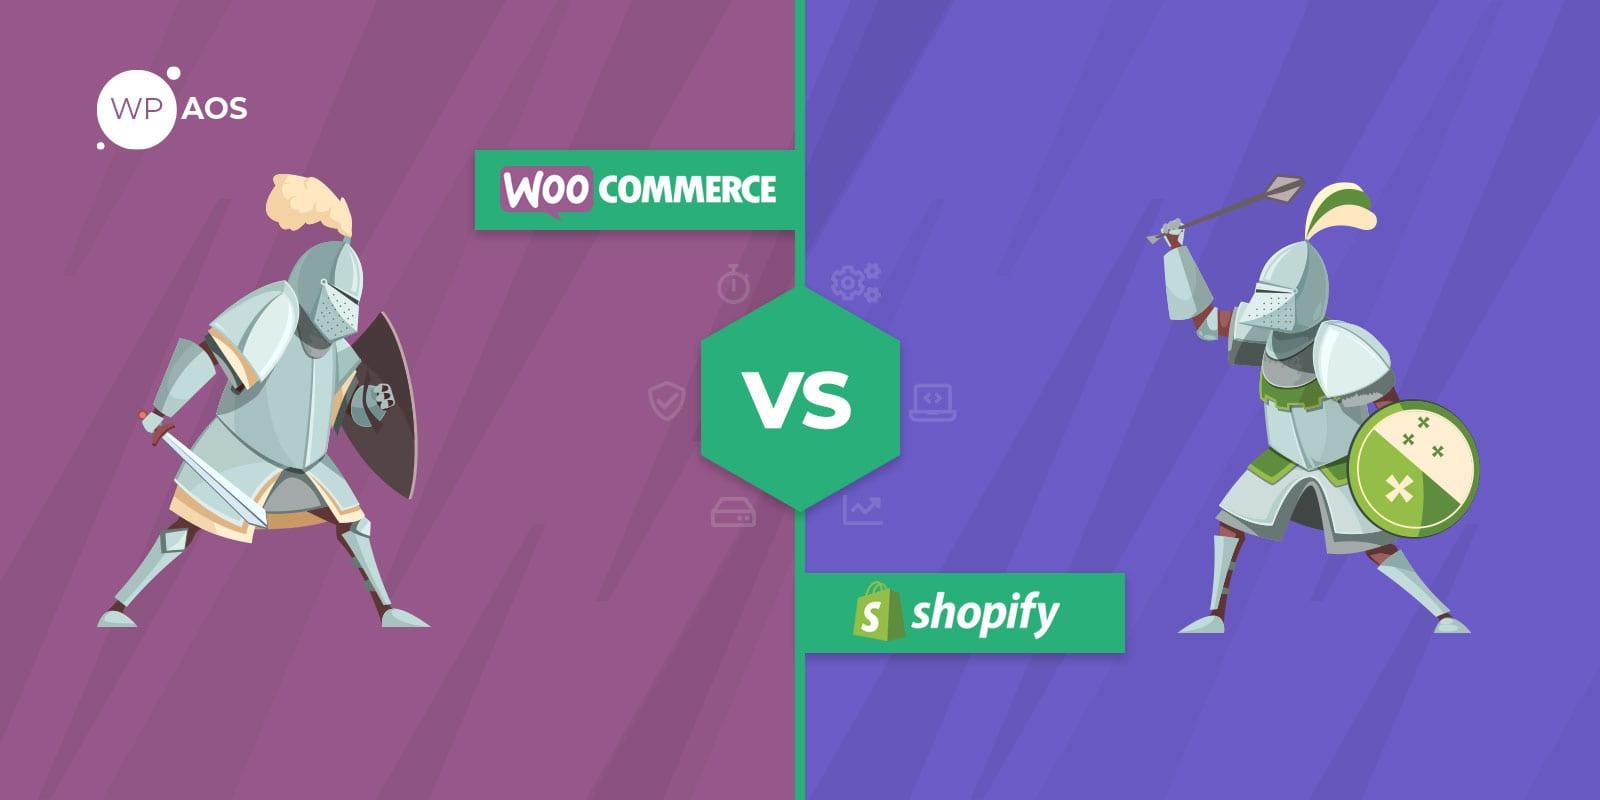 woocommerce, shopify, ecommerce, website, wpaos